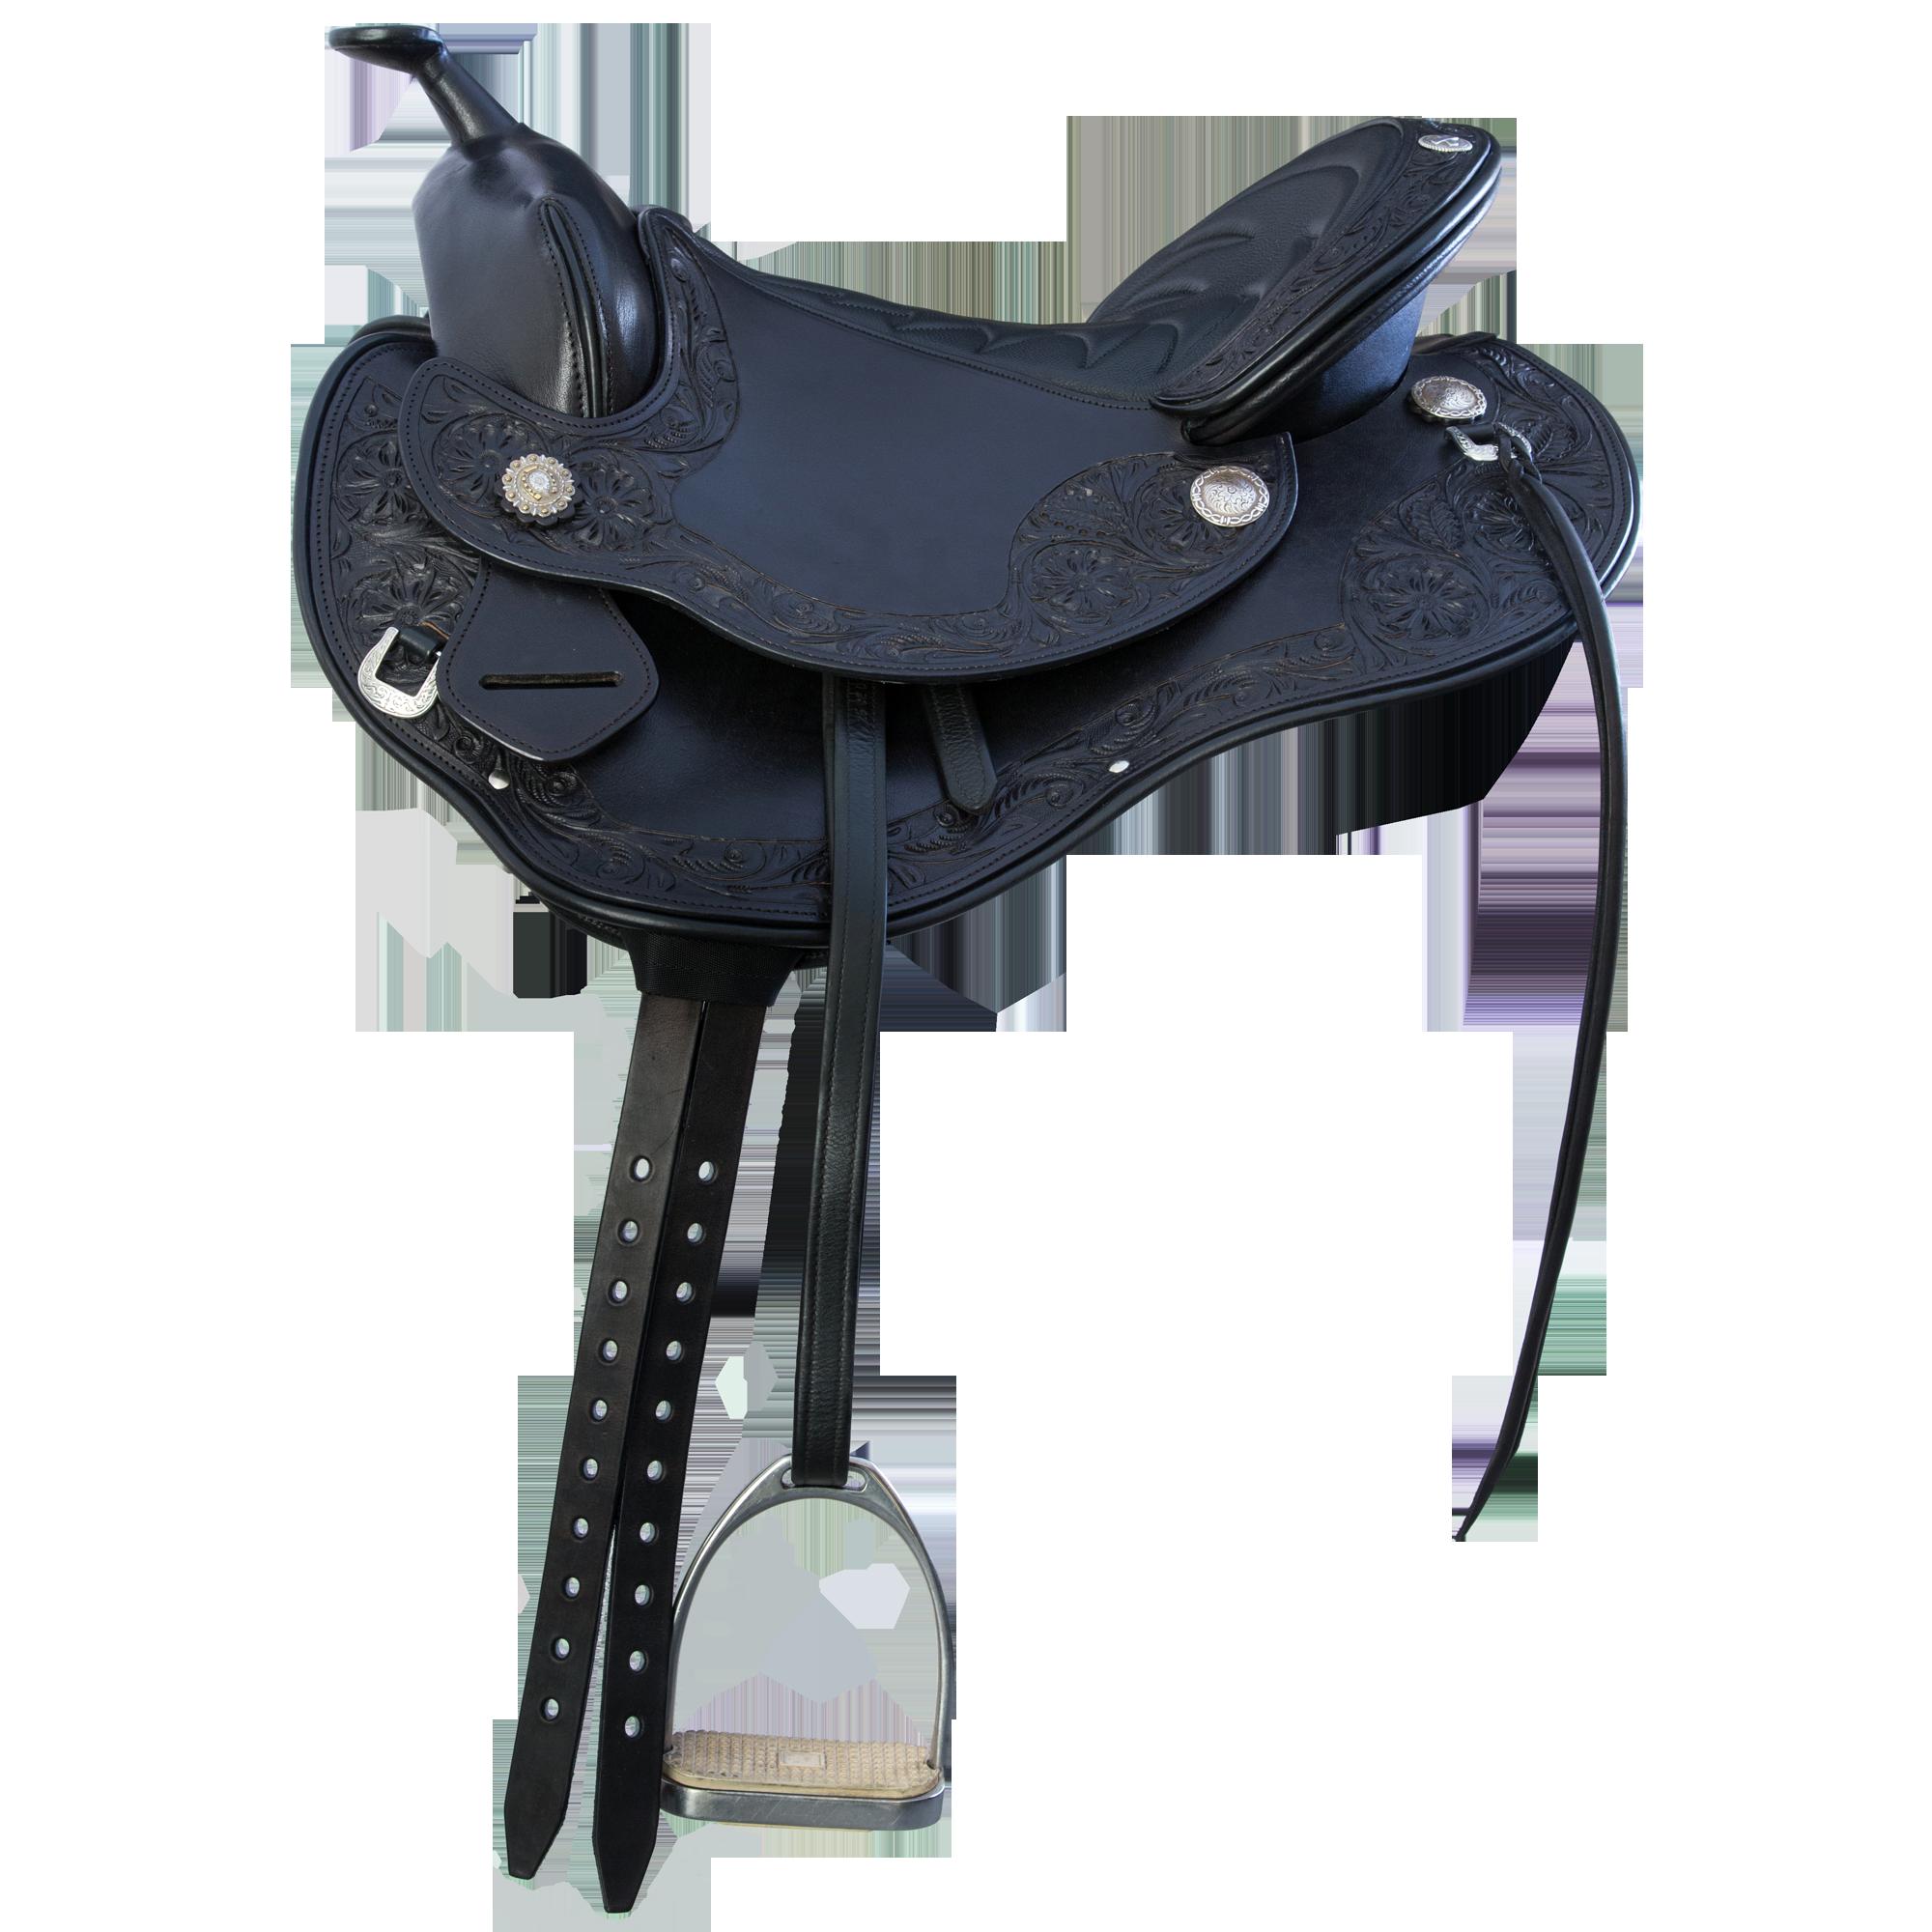 Devin Western Trail Saddle - Black - English Rigging System